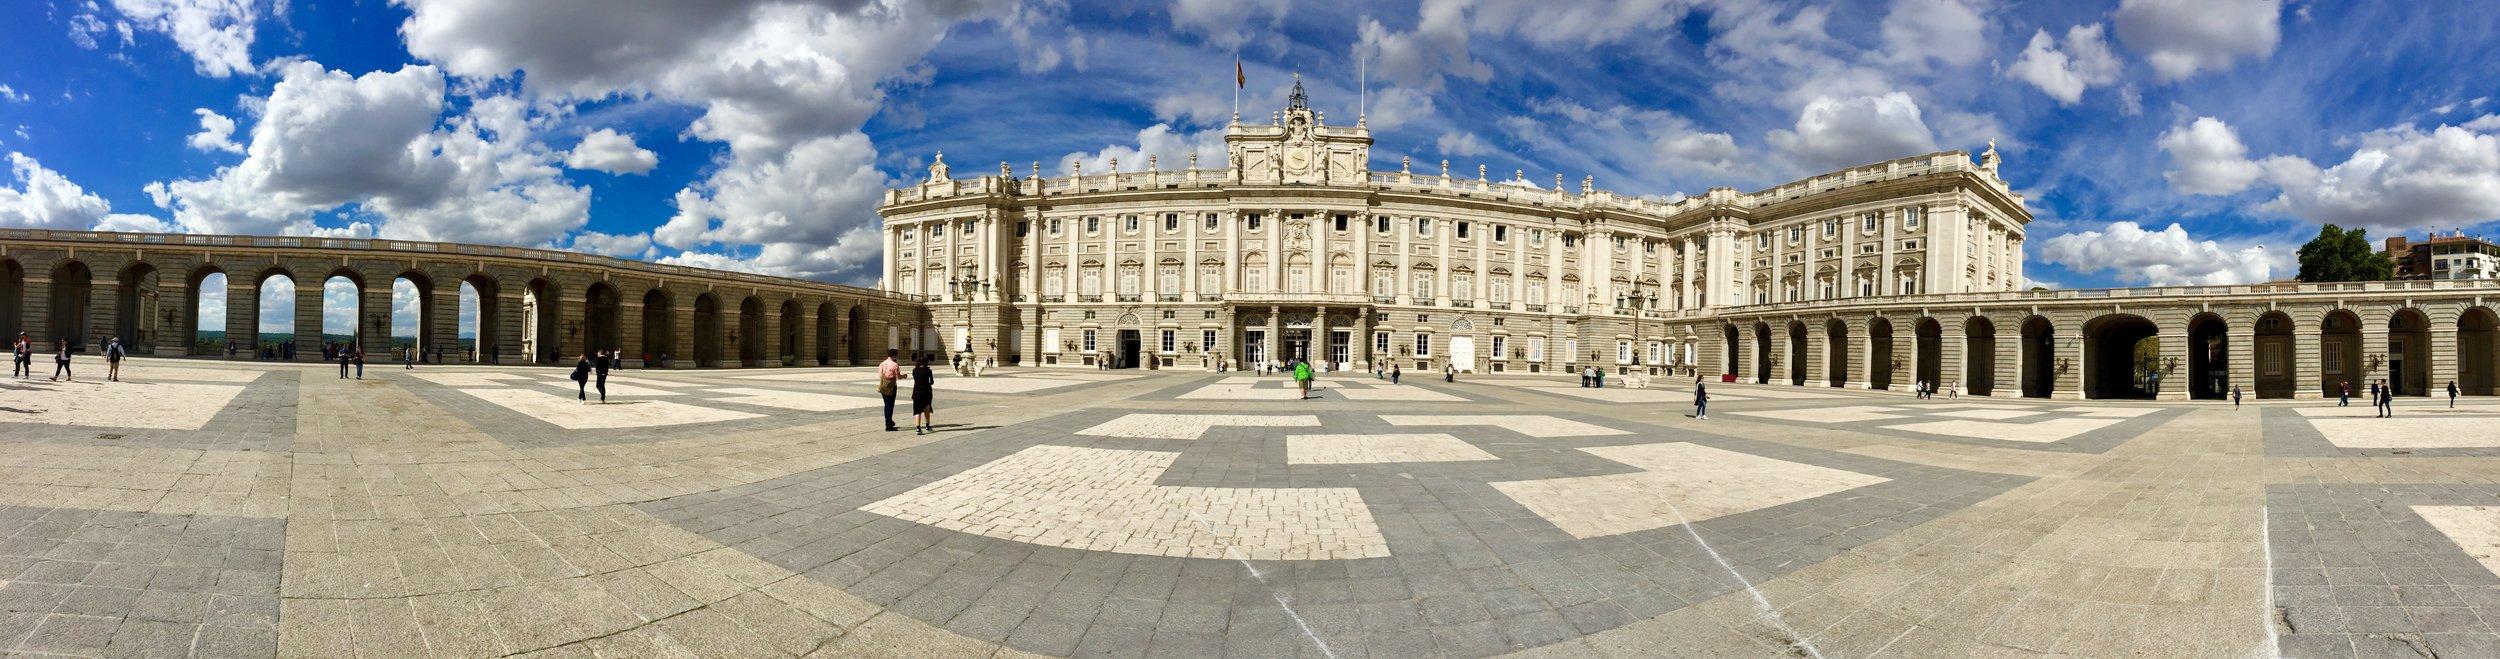 Madrid Travel 7.jpg